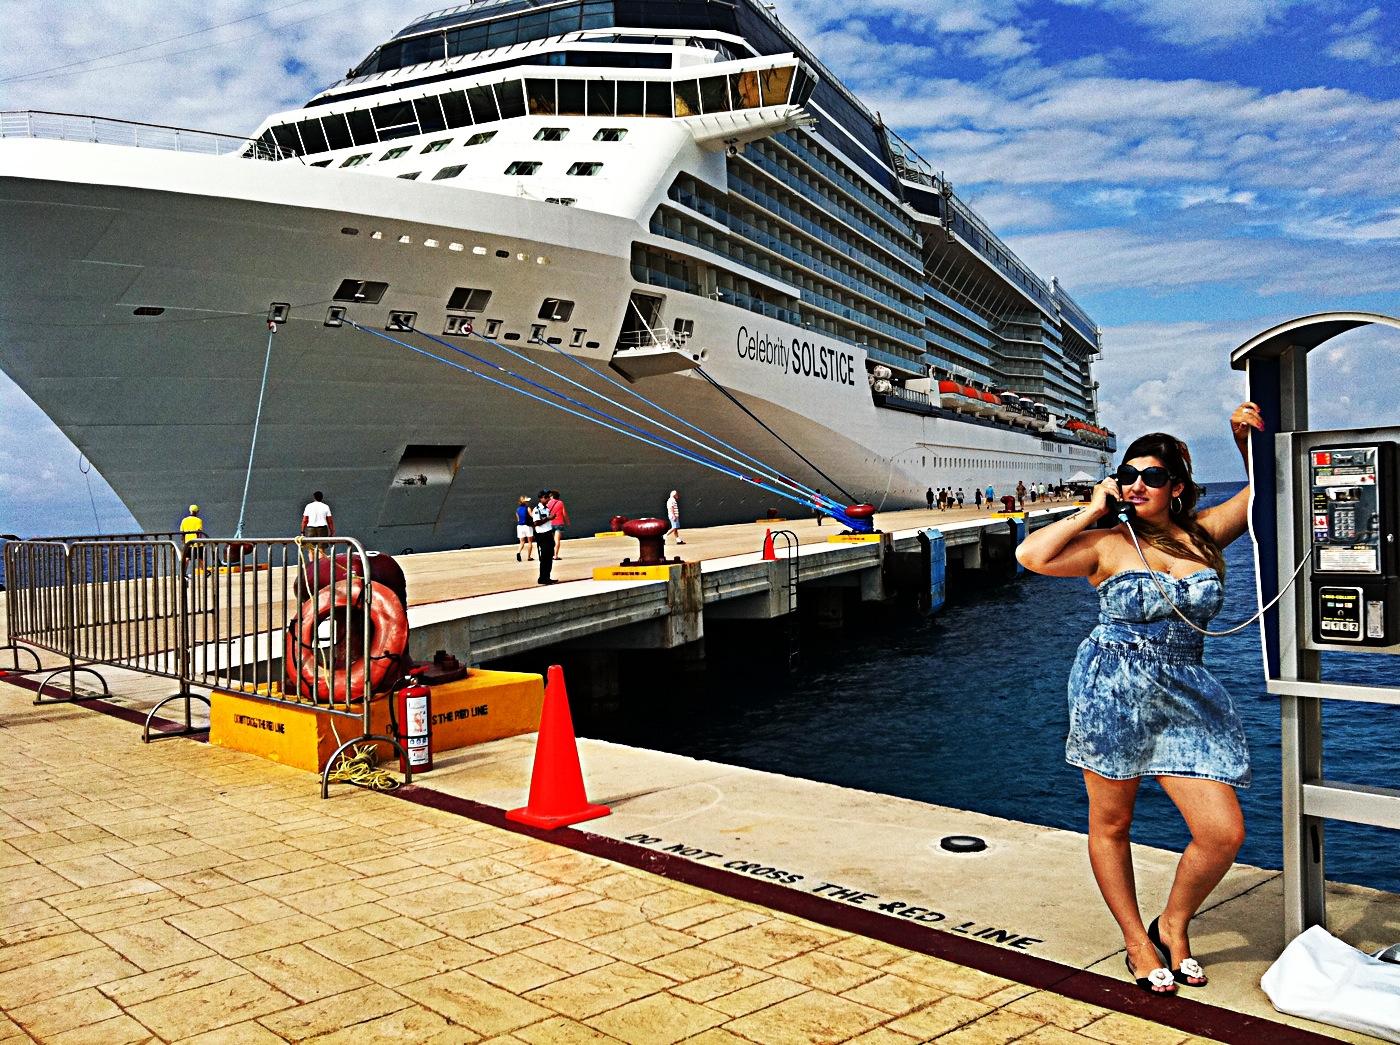 giovana quaglio, celebrity solstice, mexico, cozumel, celebrity cruises